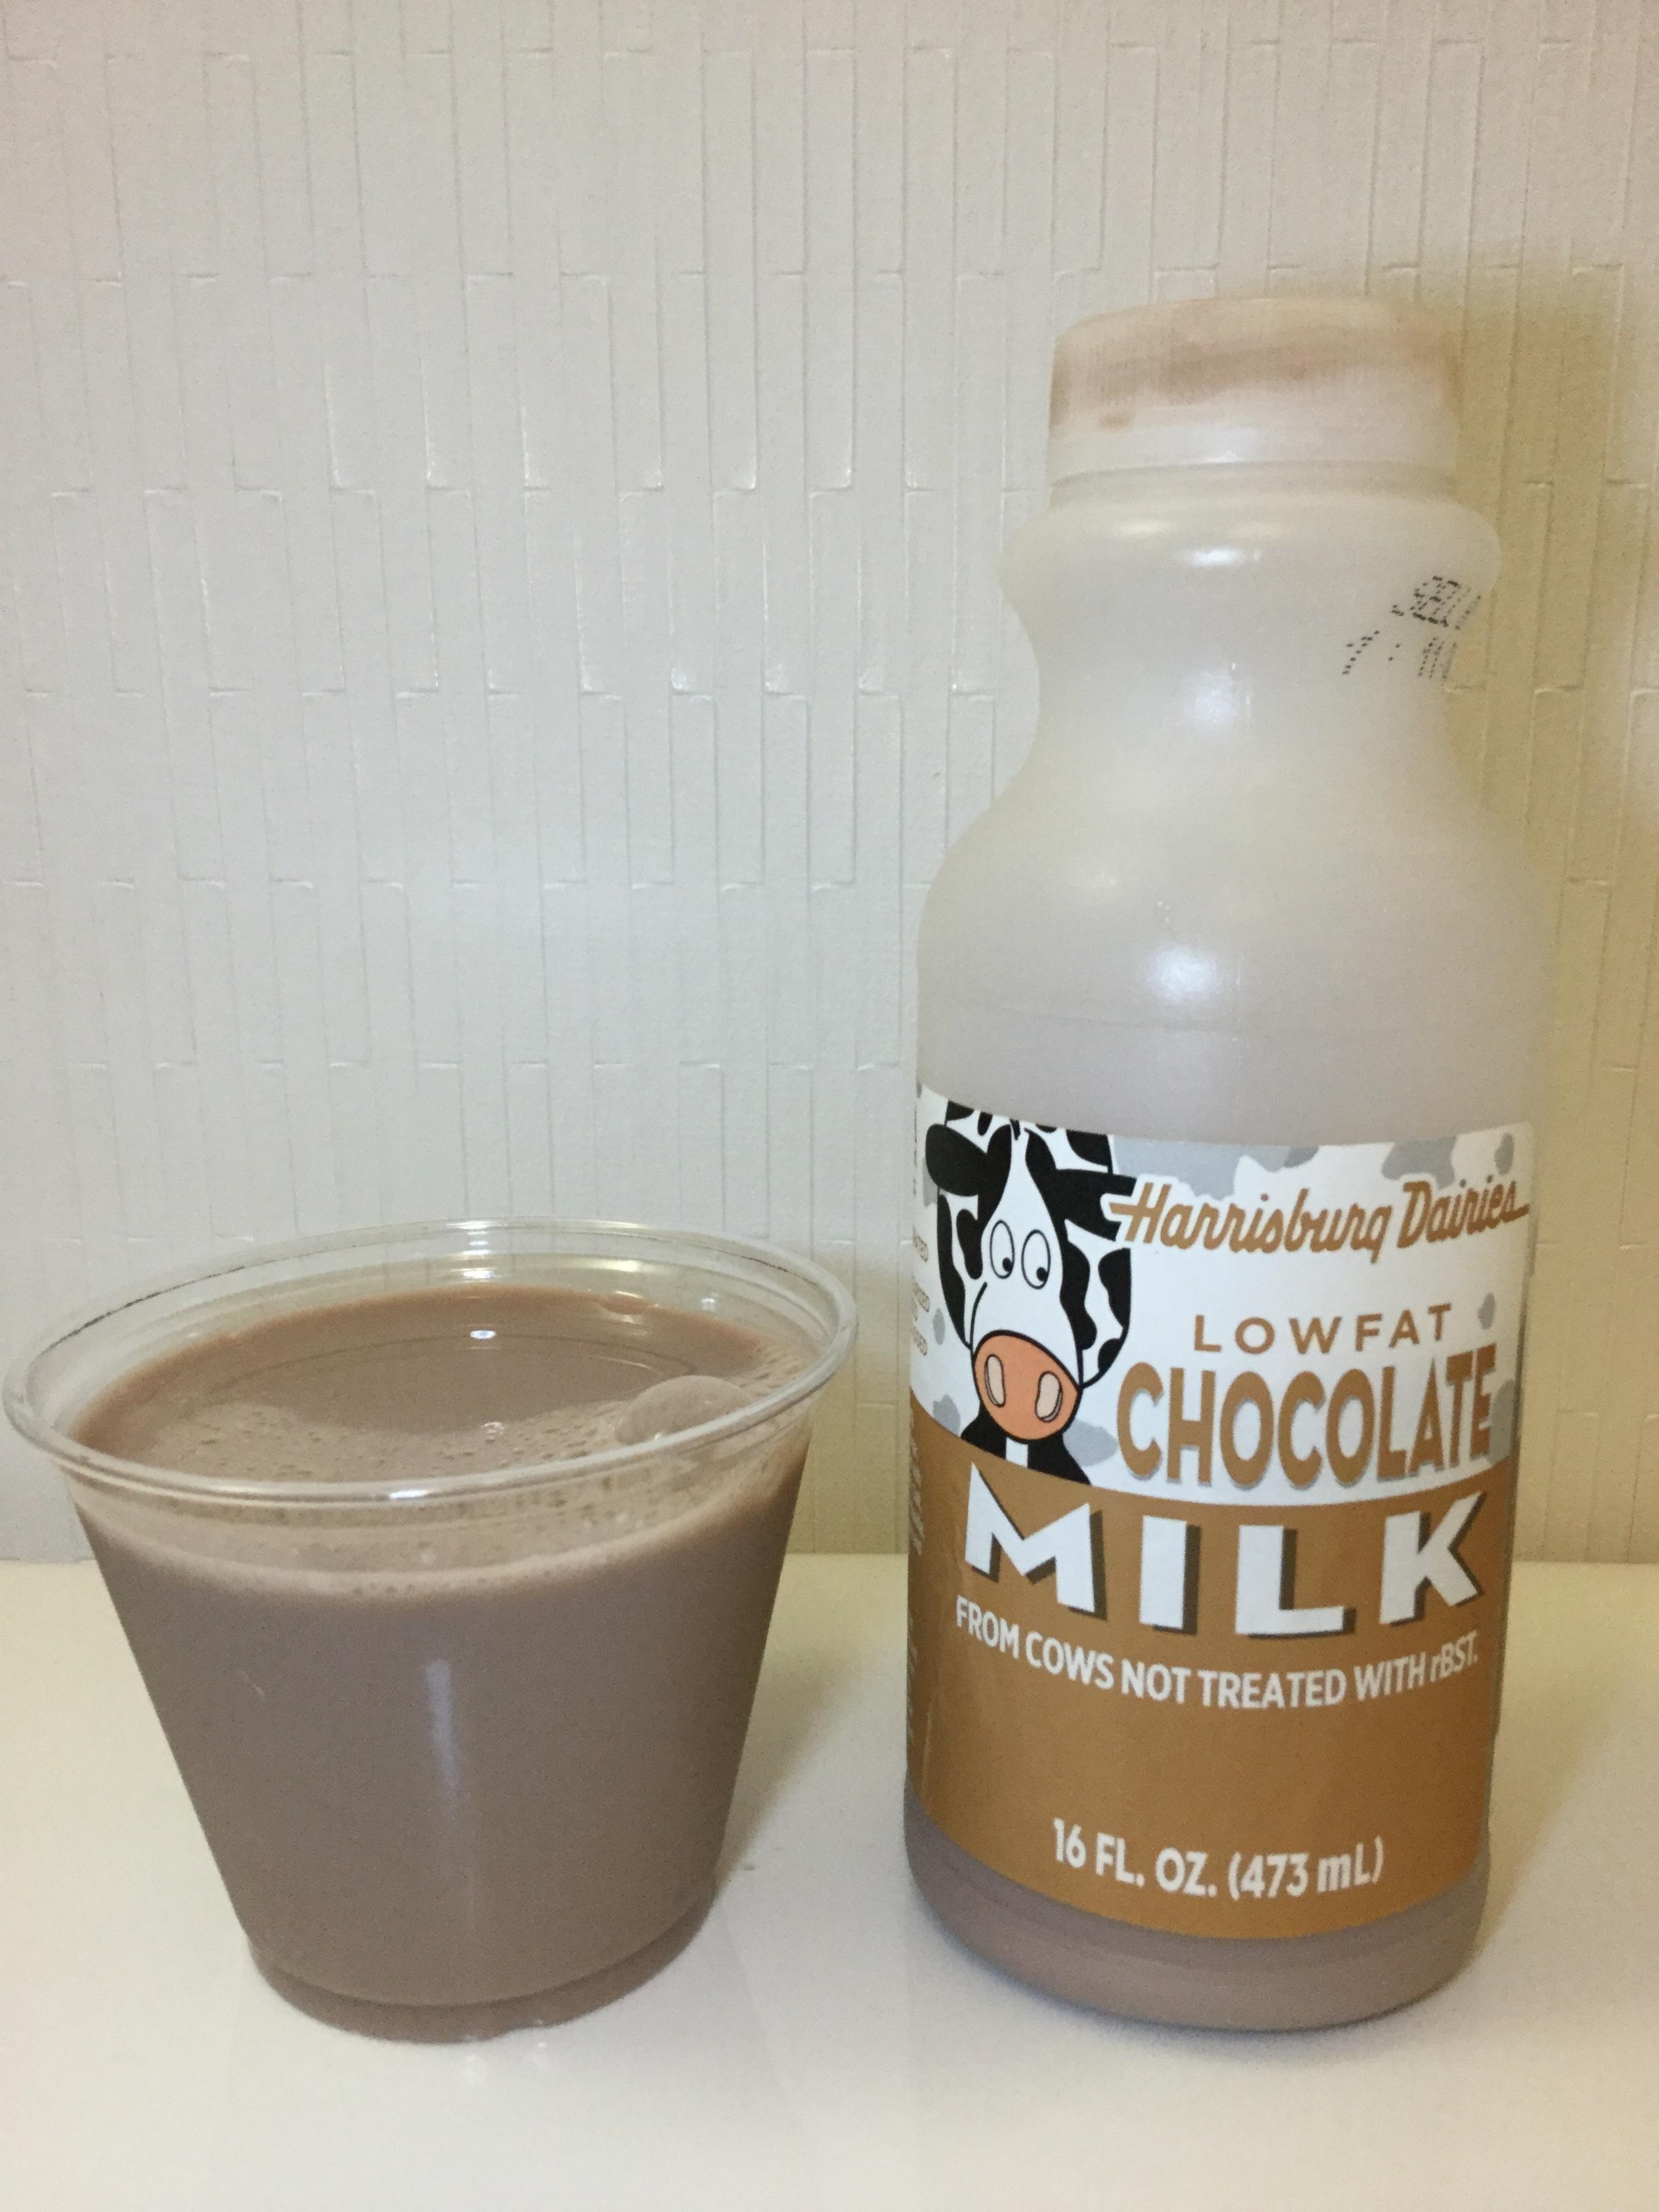 Harrisburg Dairies Lowfat Chocolate Milk Cup